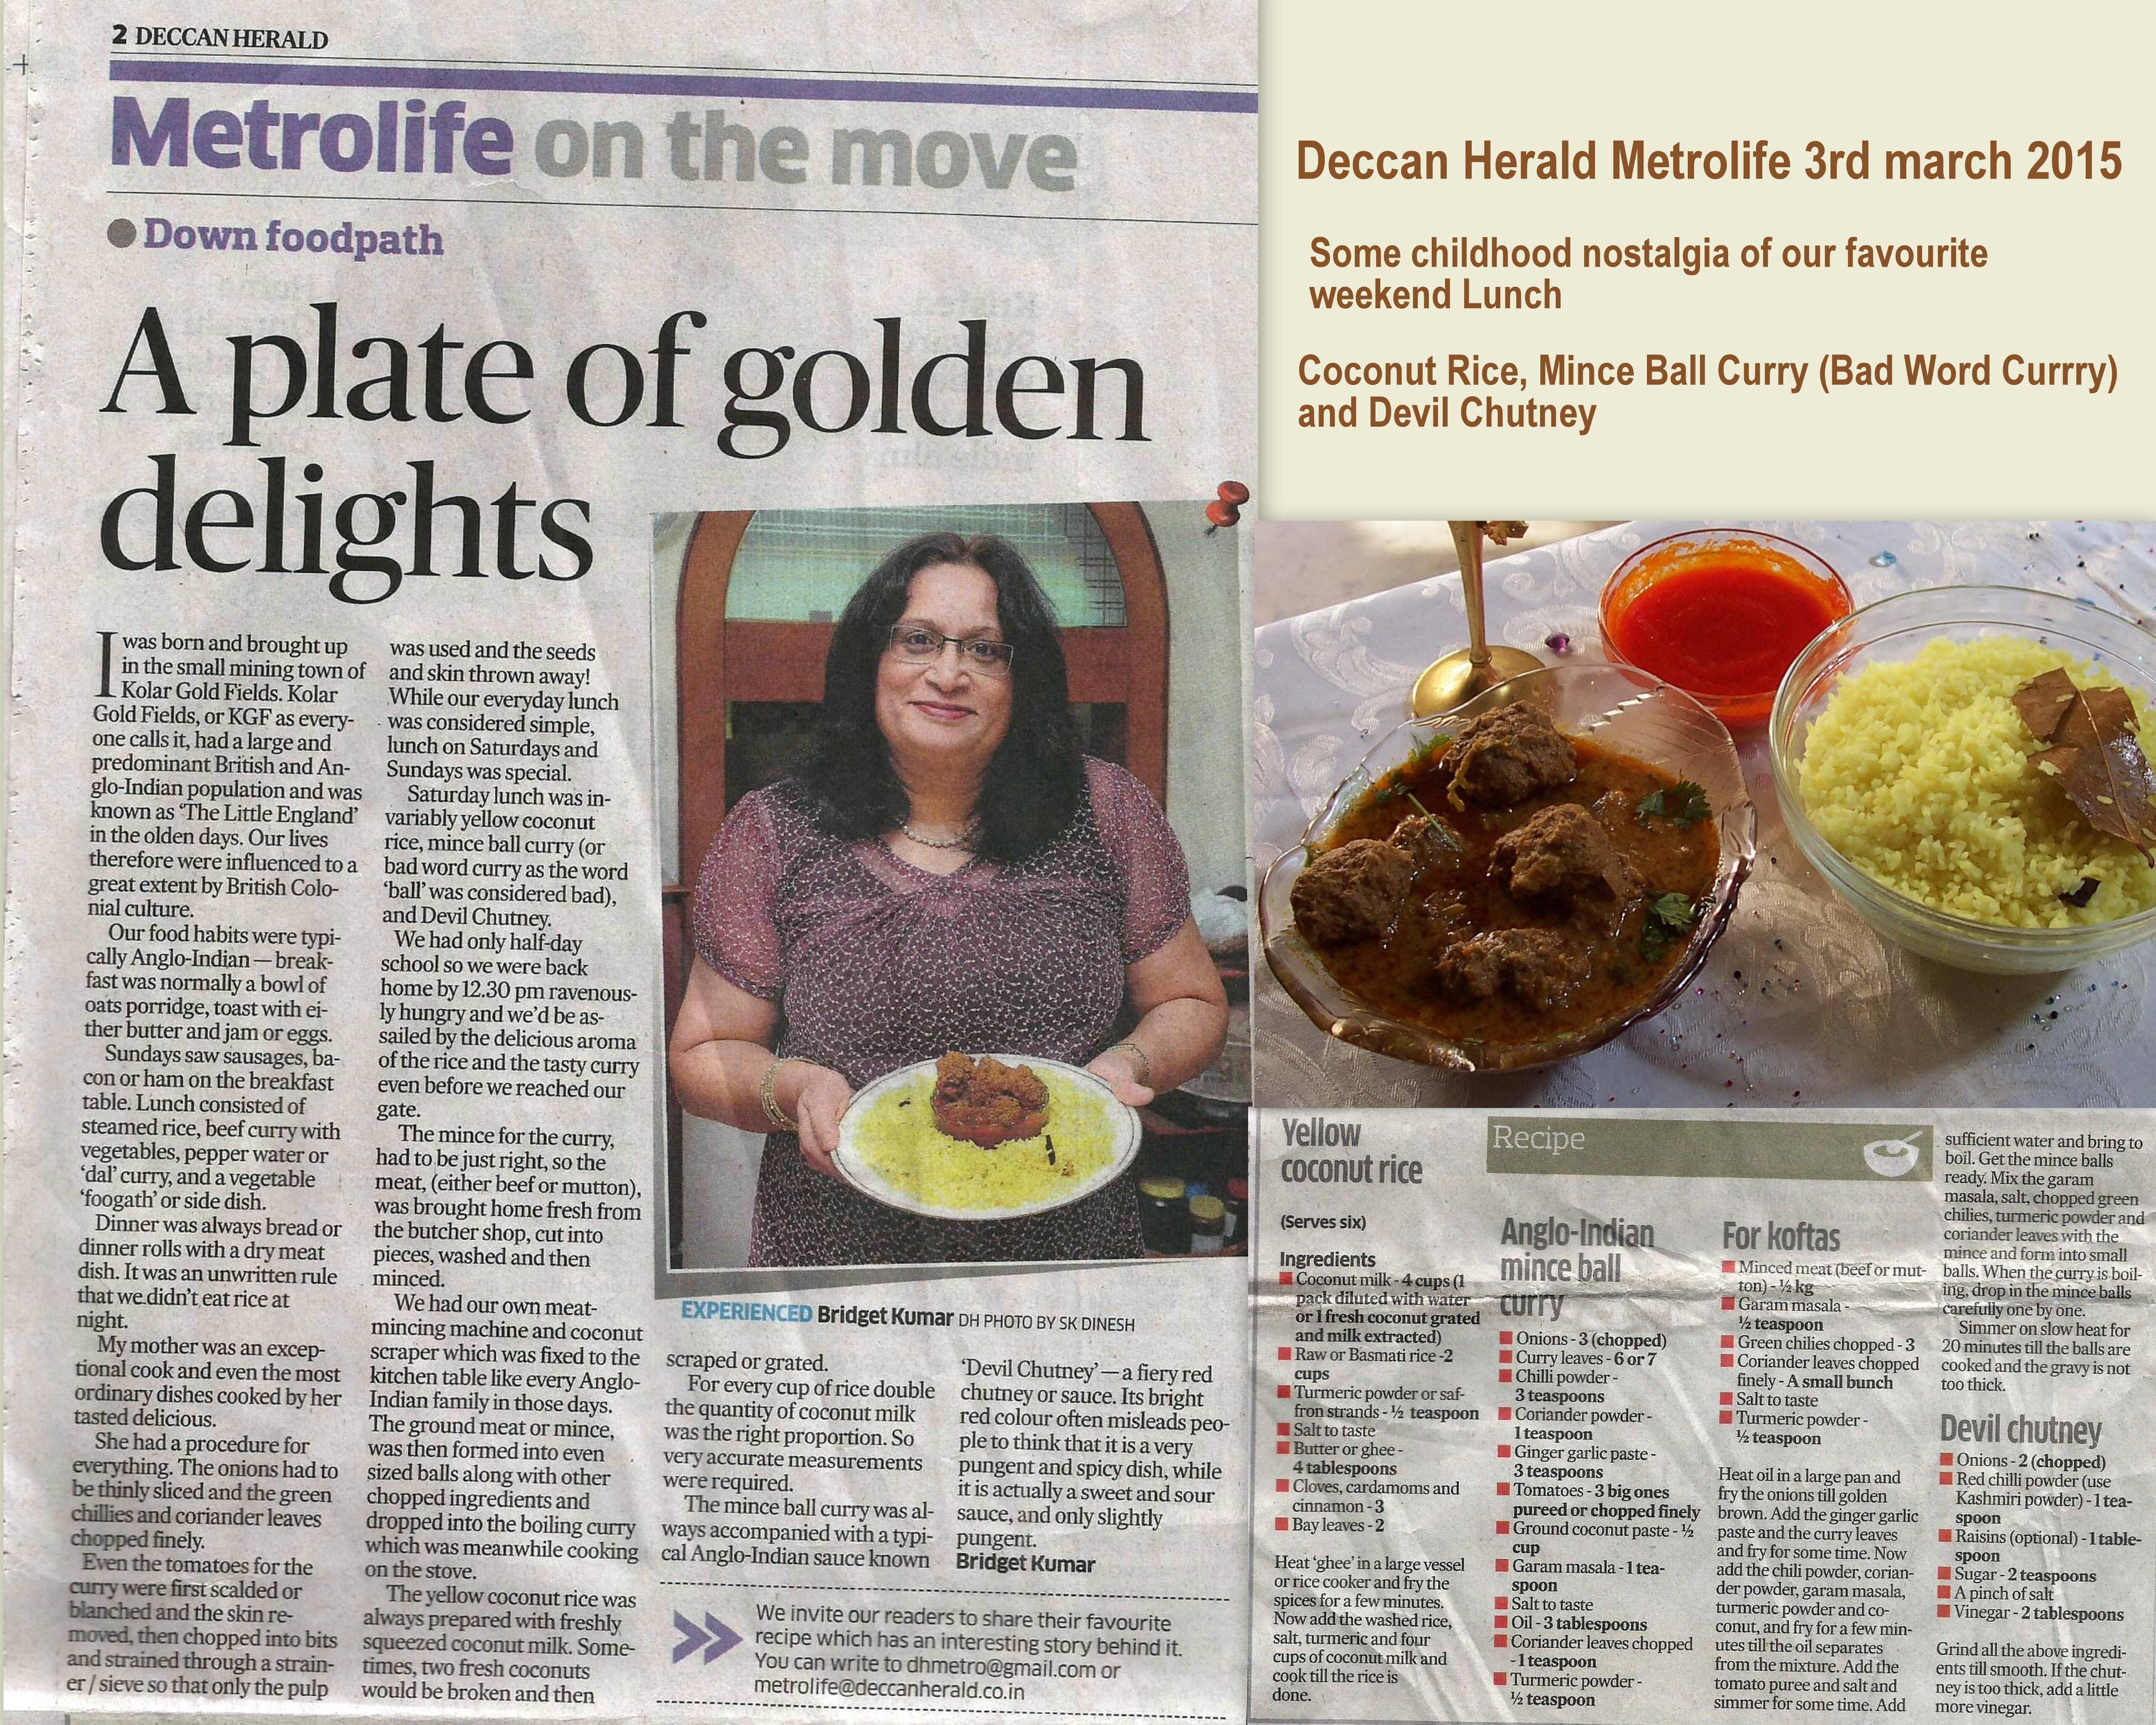 Deccan-Herald-3rd-March-2015-Coconut-Rice